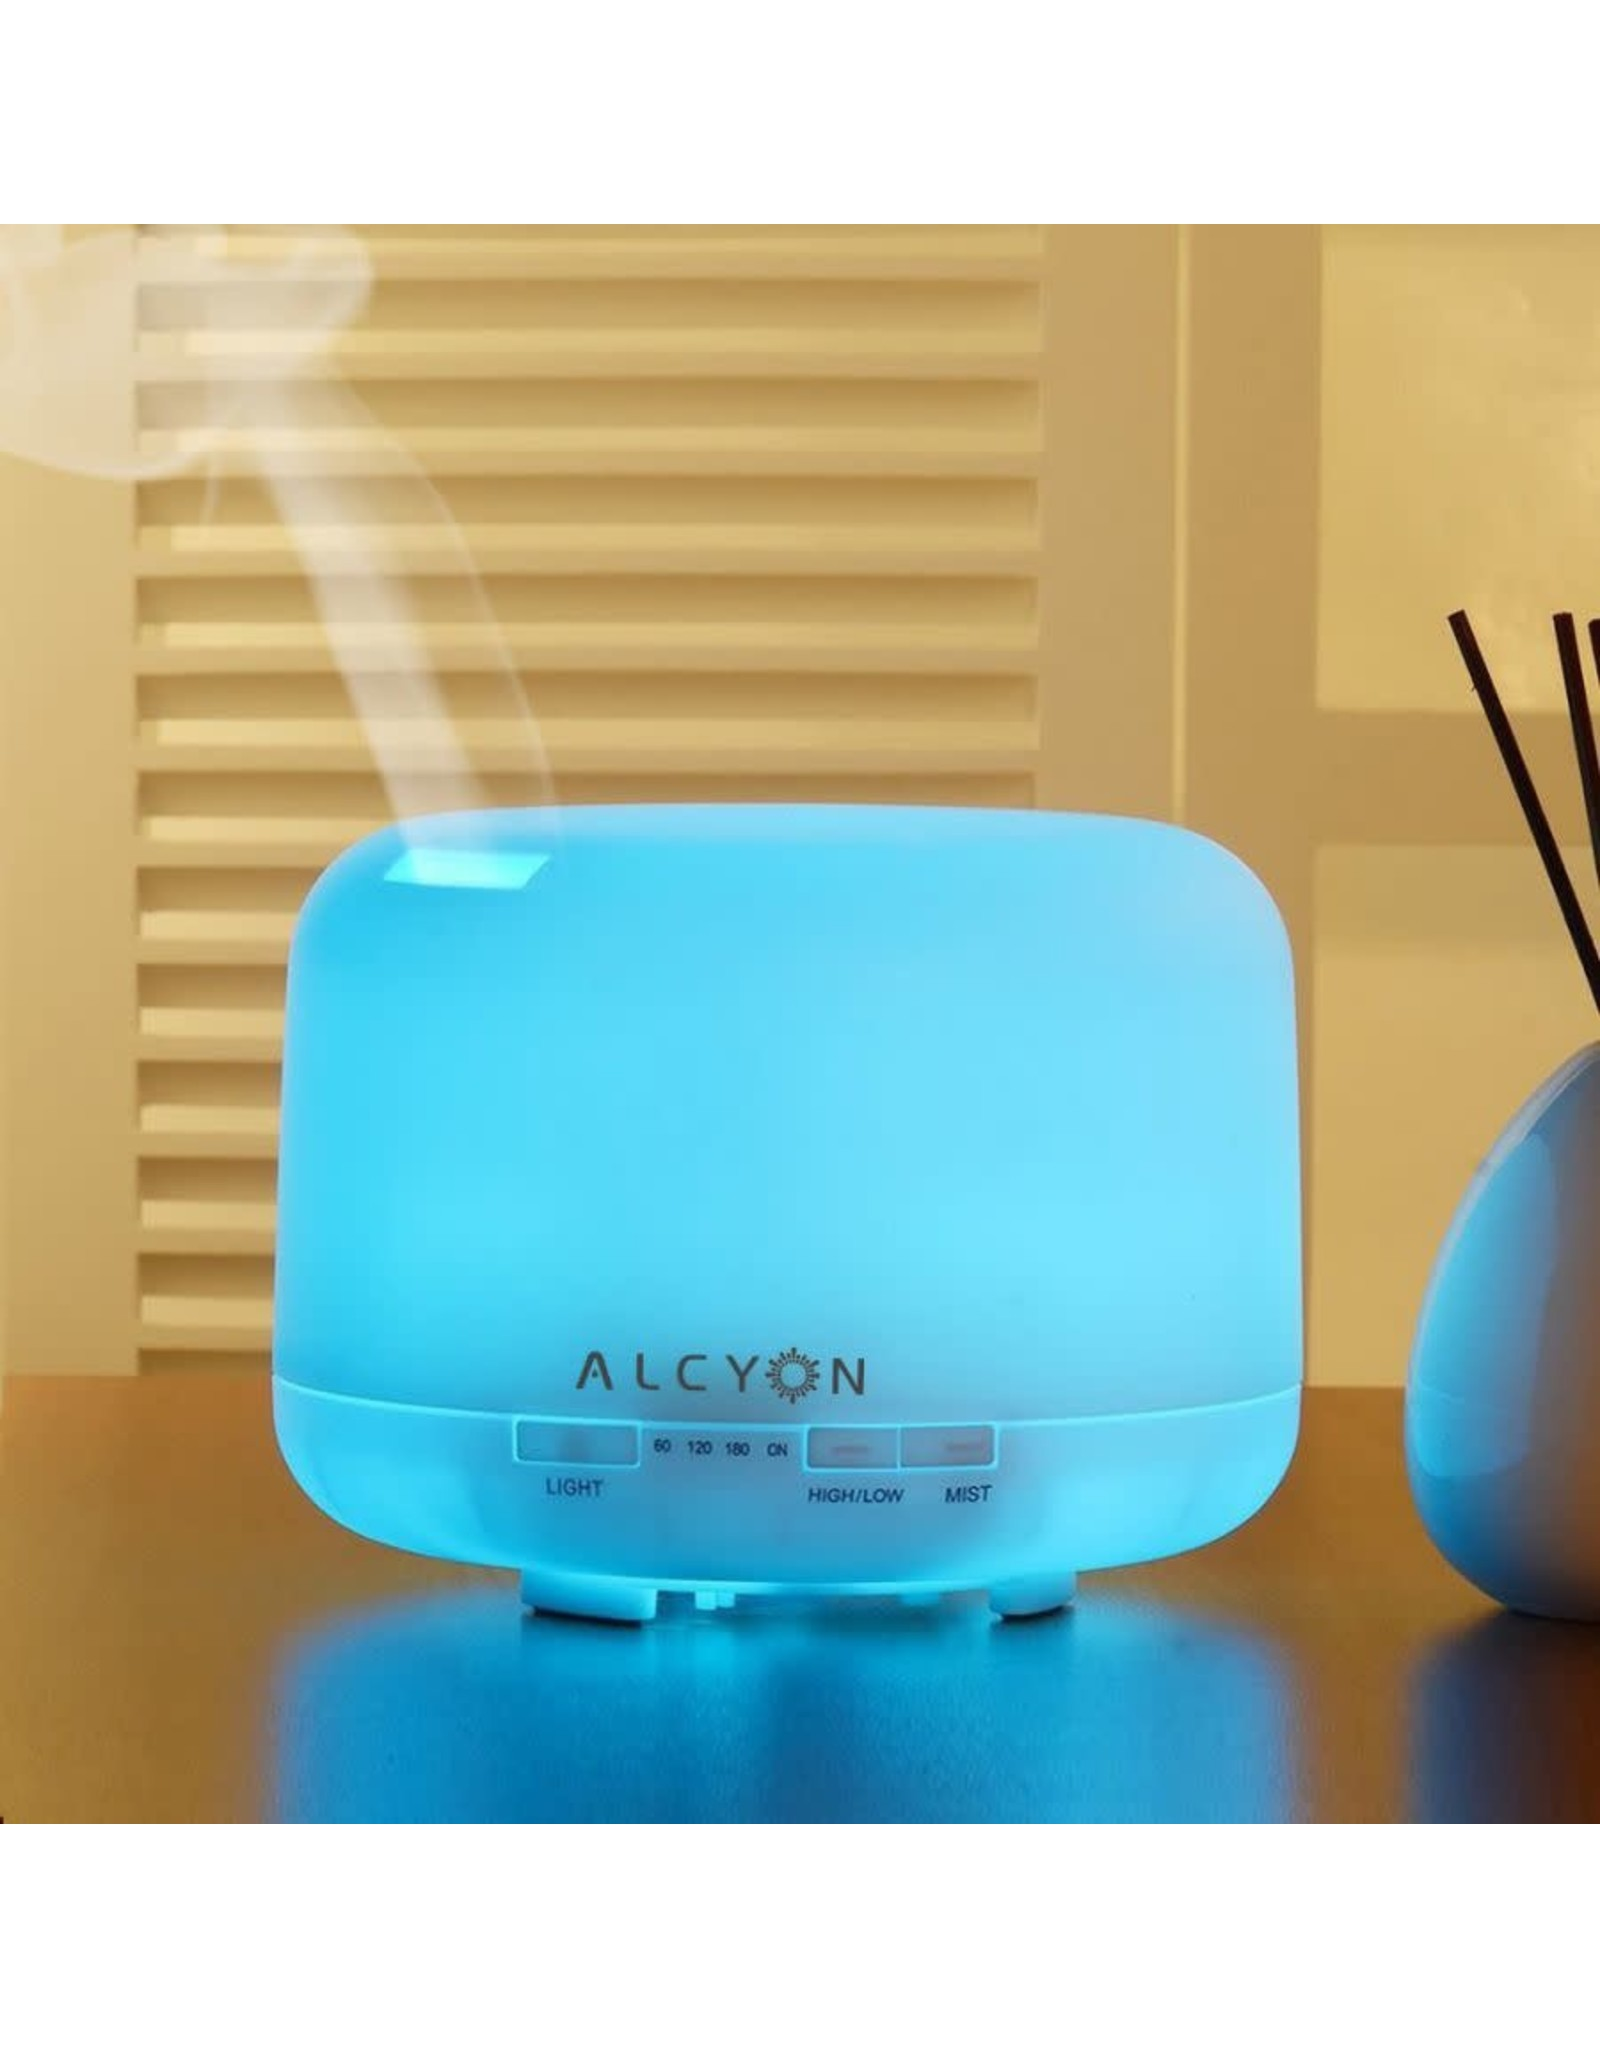 Taiko Ultrasonic Aromatherapy Diffuser